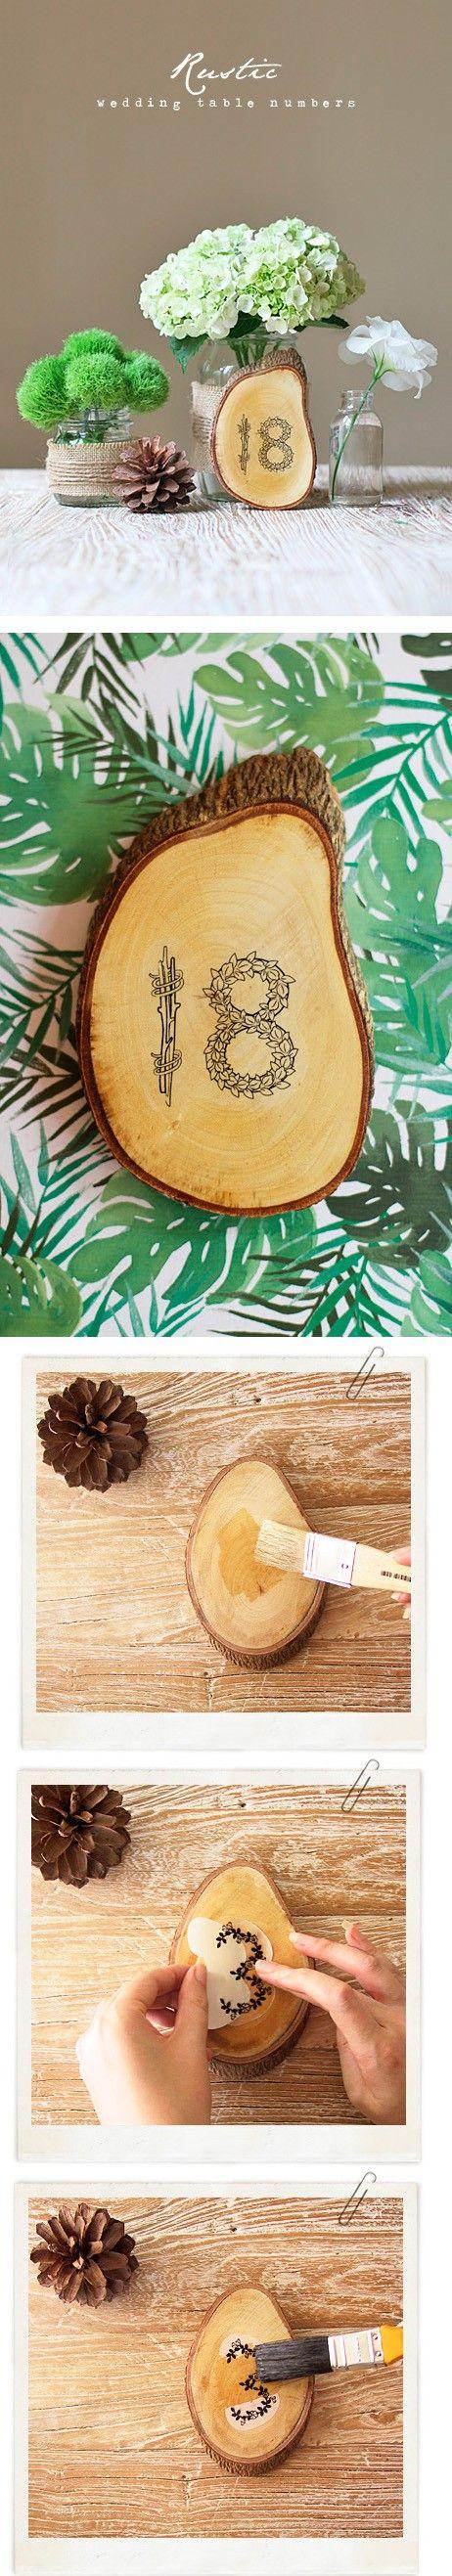 DIY Rustic wood slice table numbers #wedding #decorations